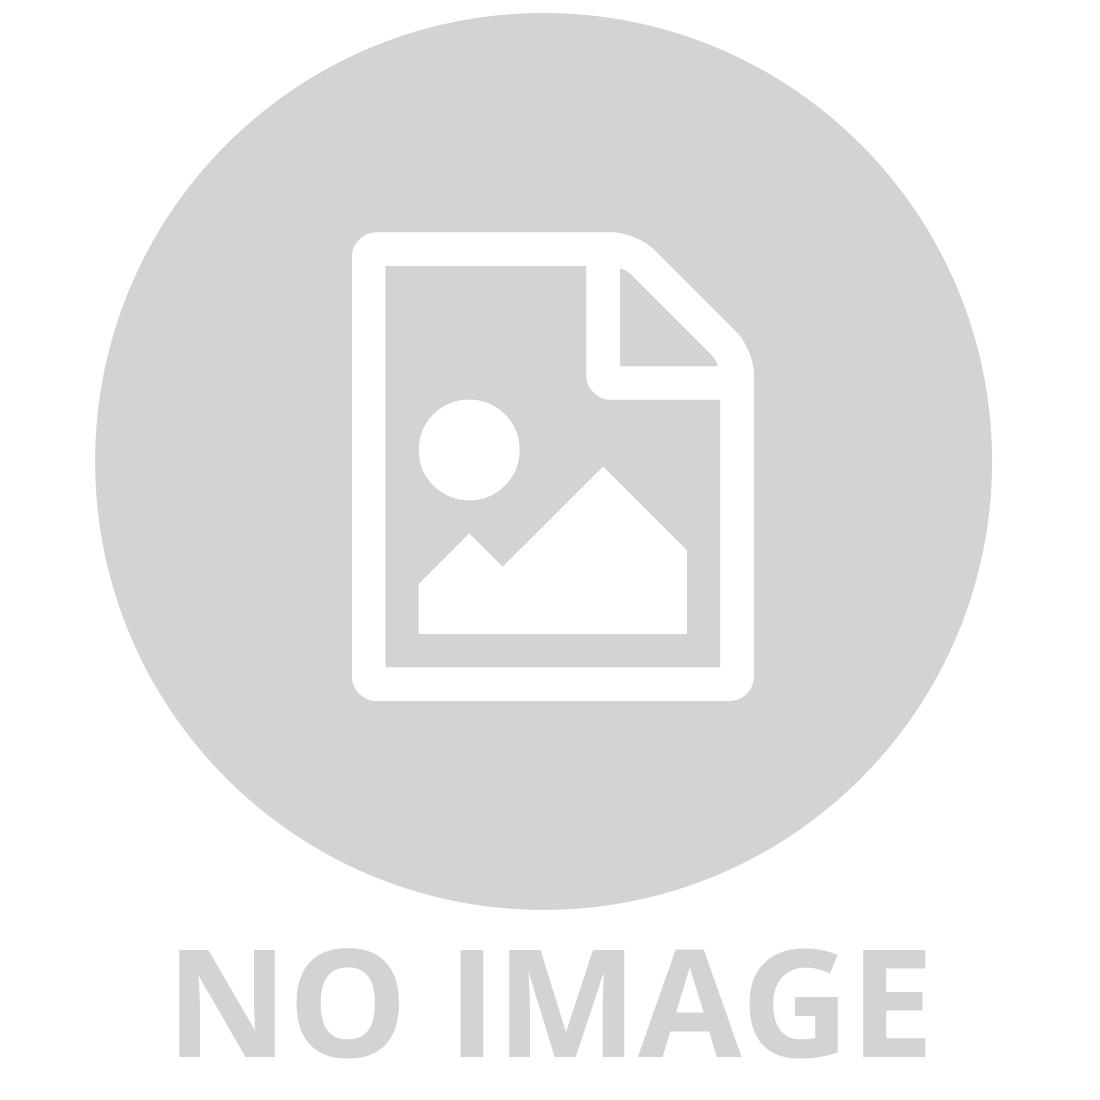 8 shot Caps (72 shots on card)